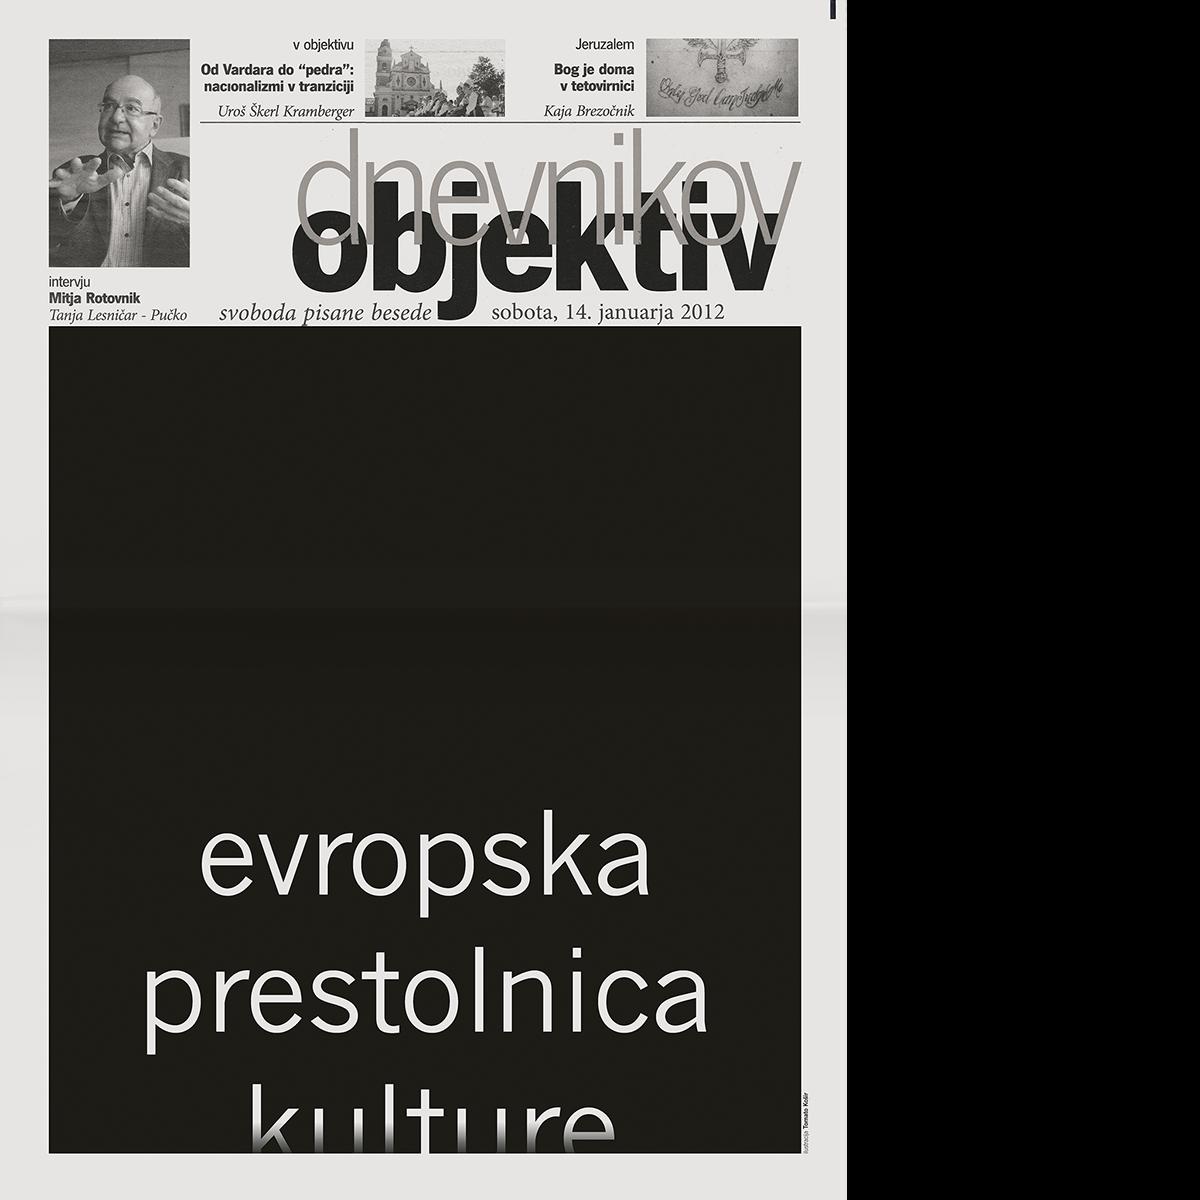 newspaper cover illustrations political slovenia tomato košir samo ačko Photo Manipulation  typographical Minimalism vector photo illustration  Art Directors Club ADC ADC New York